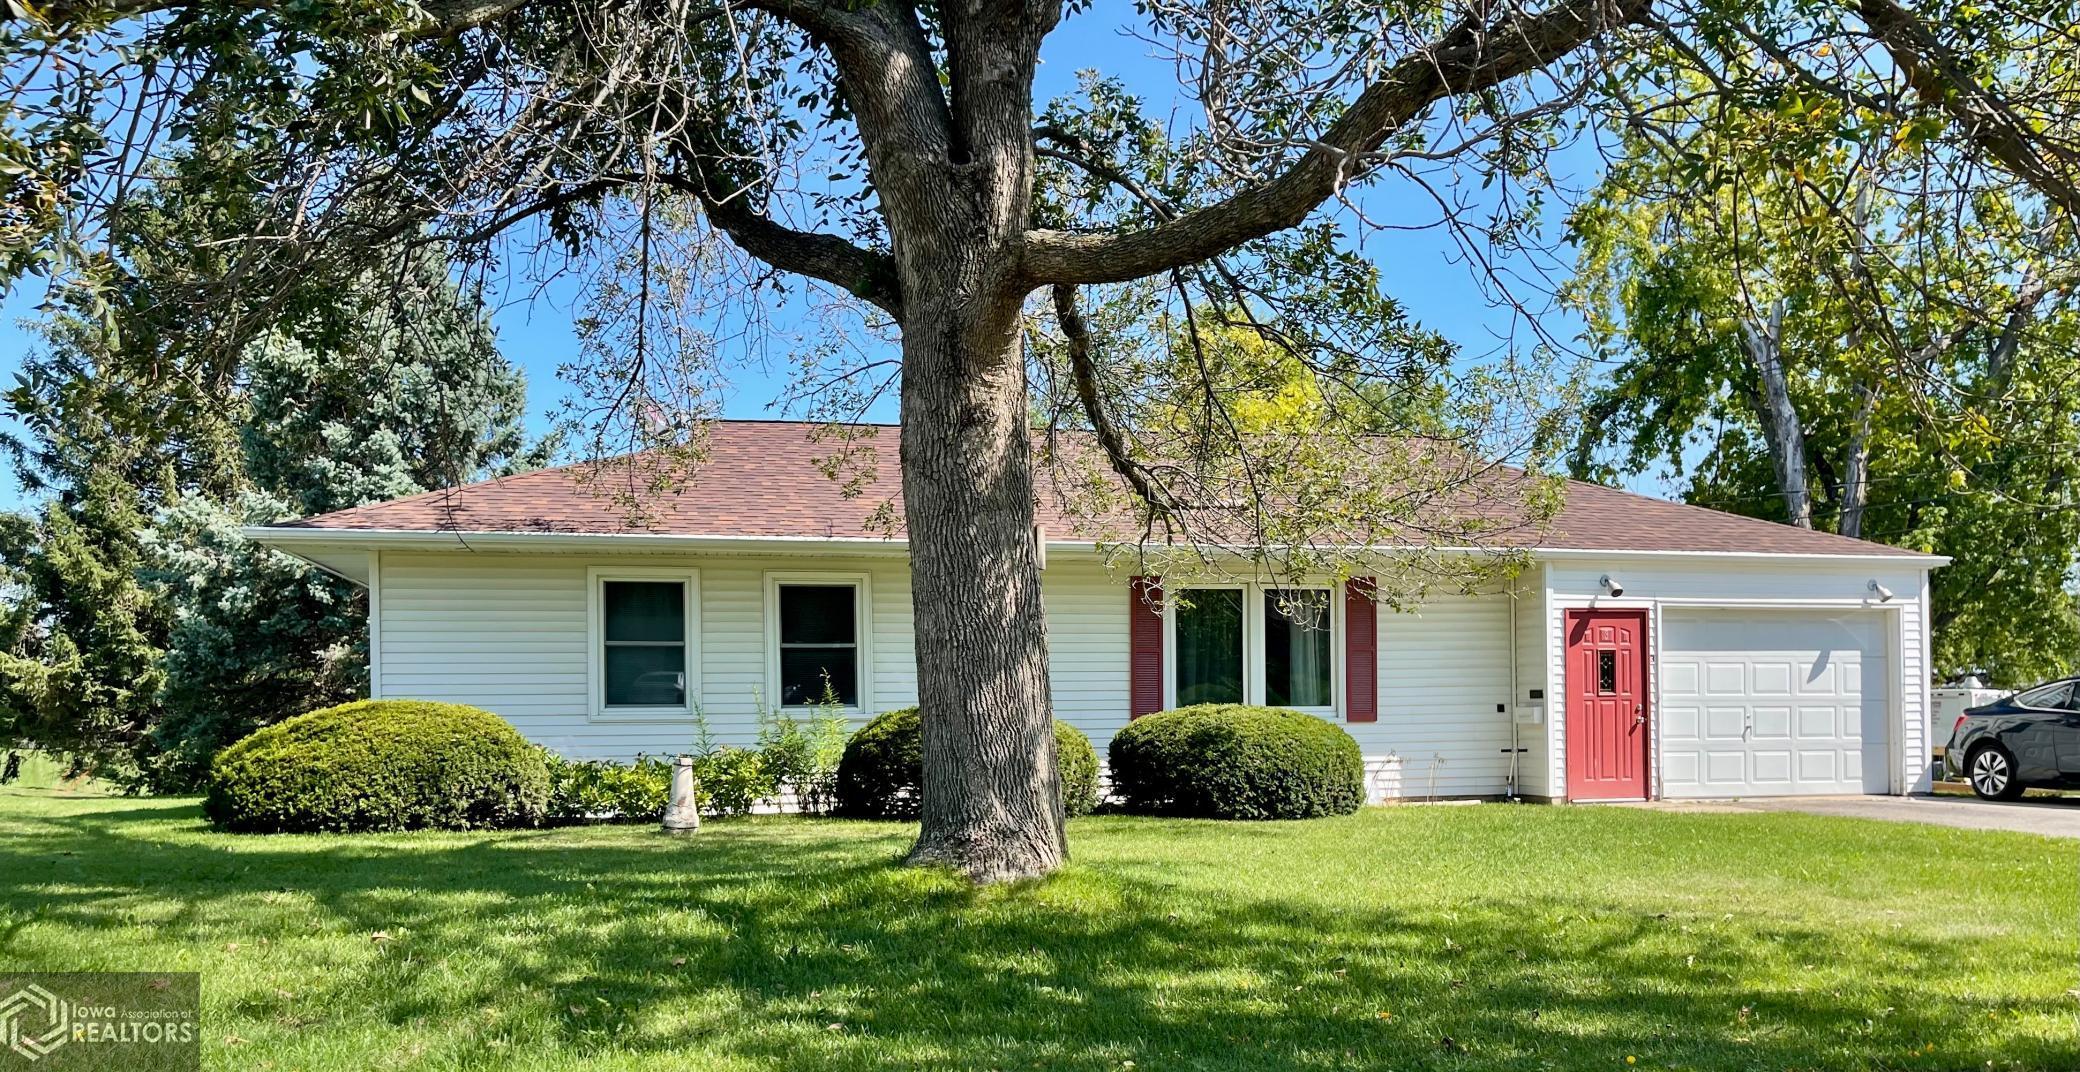 3 Edgeland, Marshalltown, Iowa 50158-4216, 3 Bedrooms Bedrooms, ,1 BathroomBathrooms,Single Family,For Sale,Edgeland,6096041